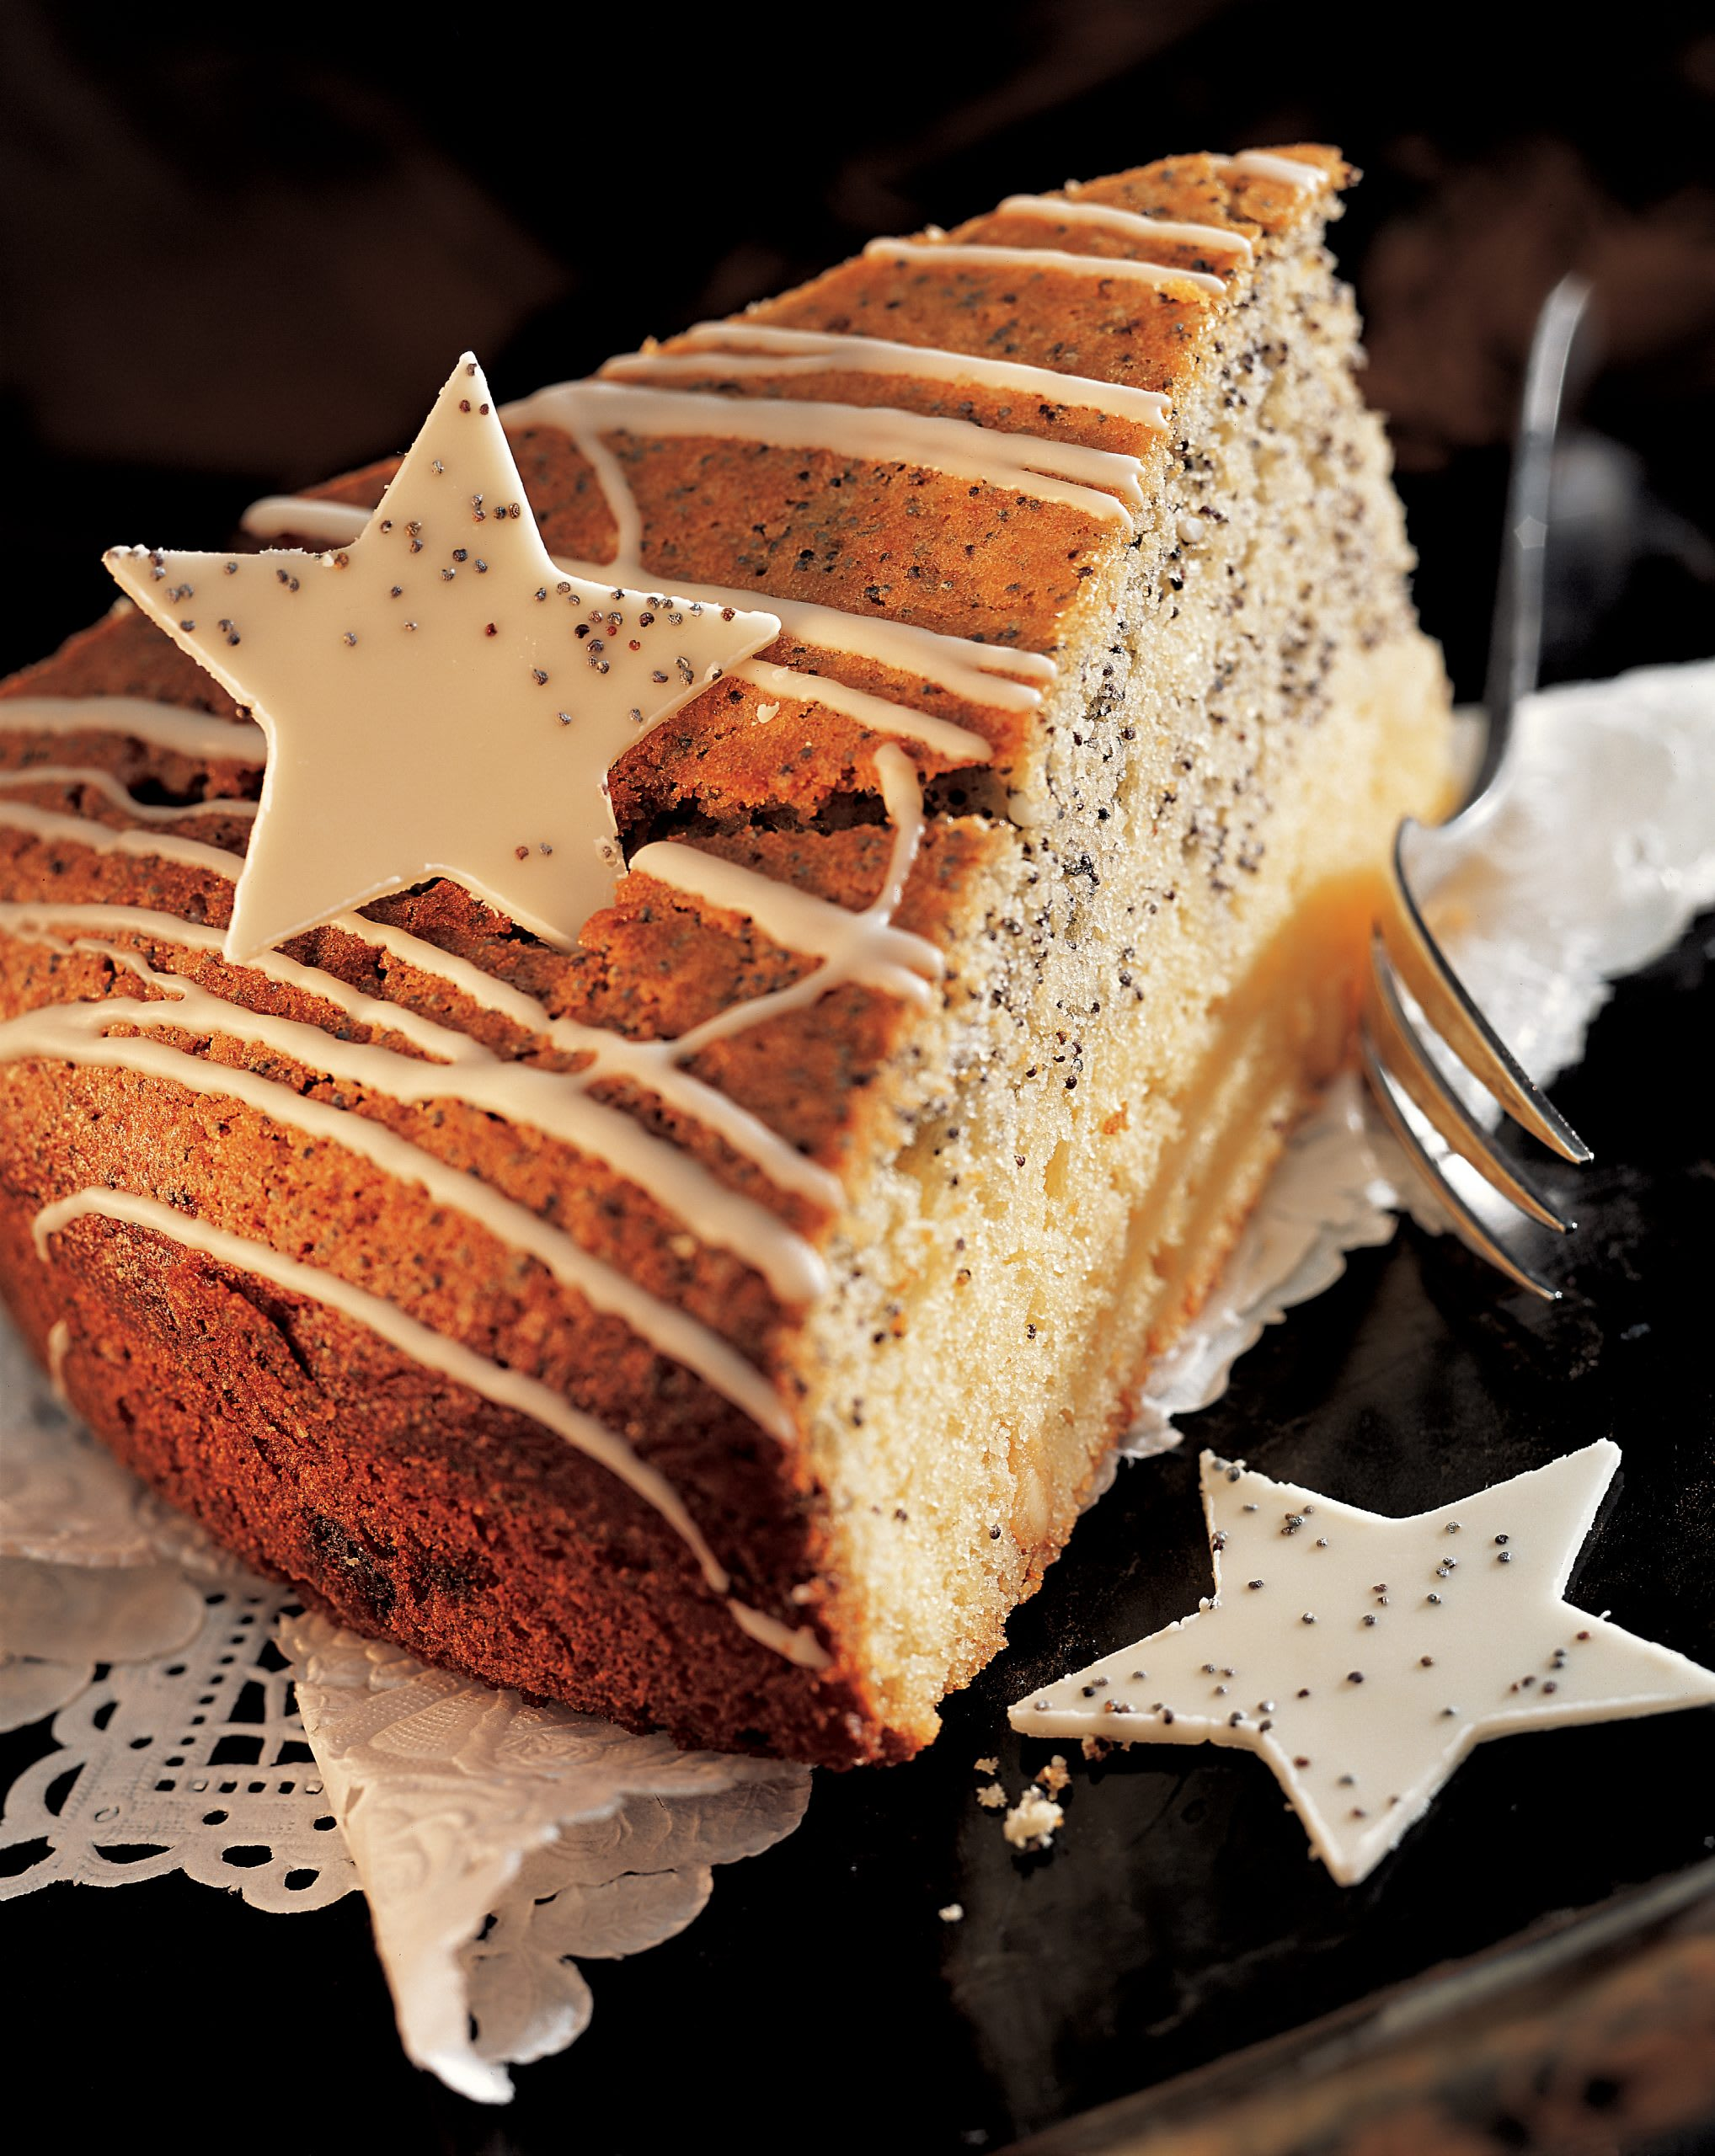 Weisser Schokoladen-Mohn-Kuchen